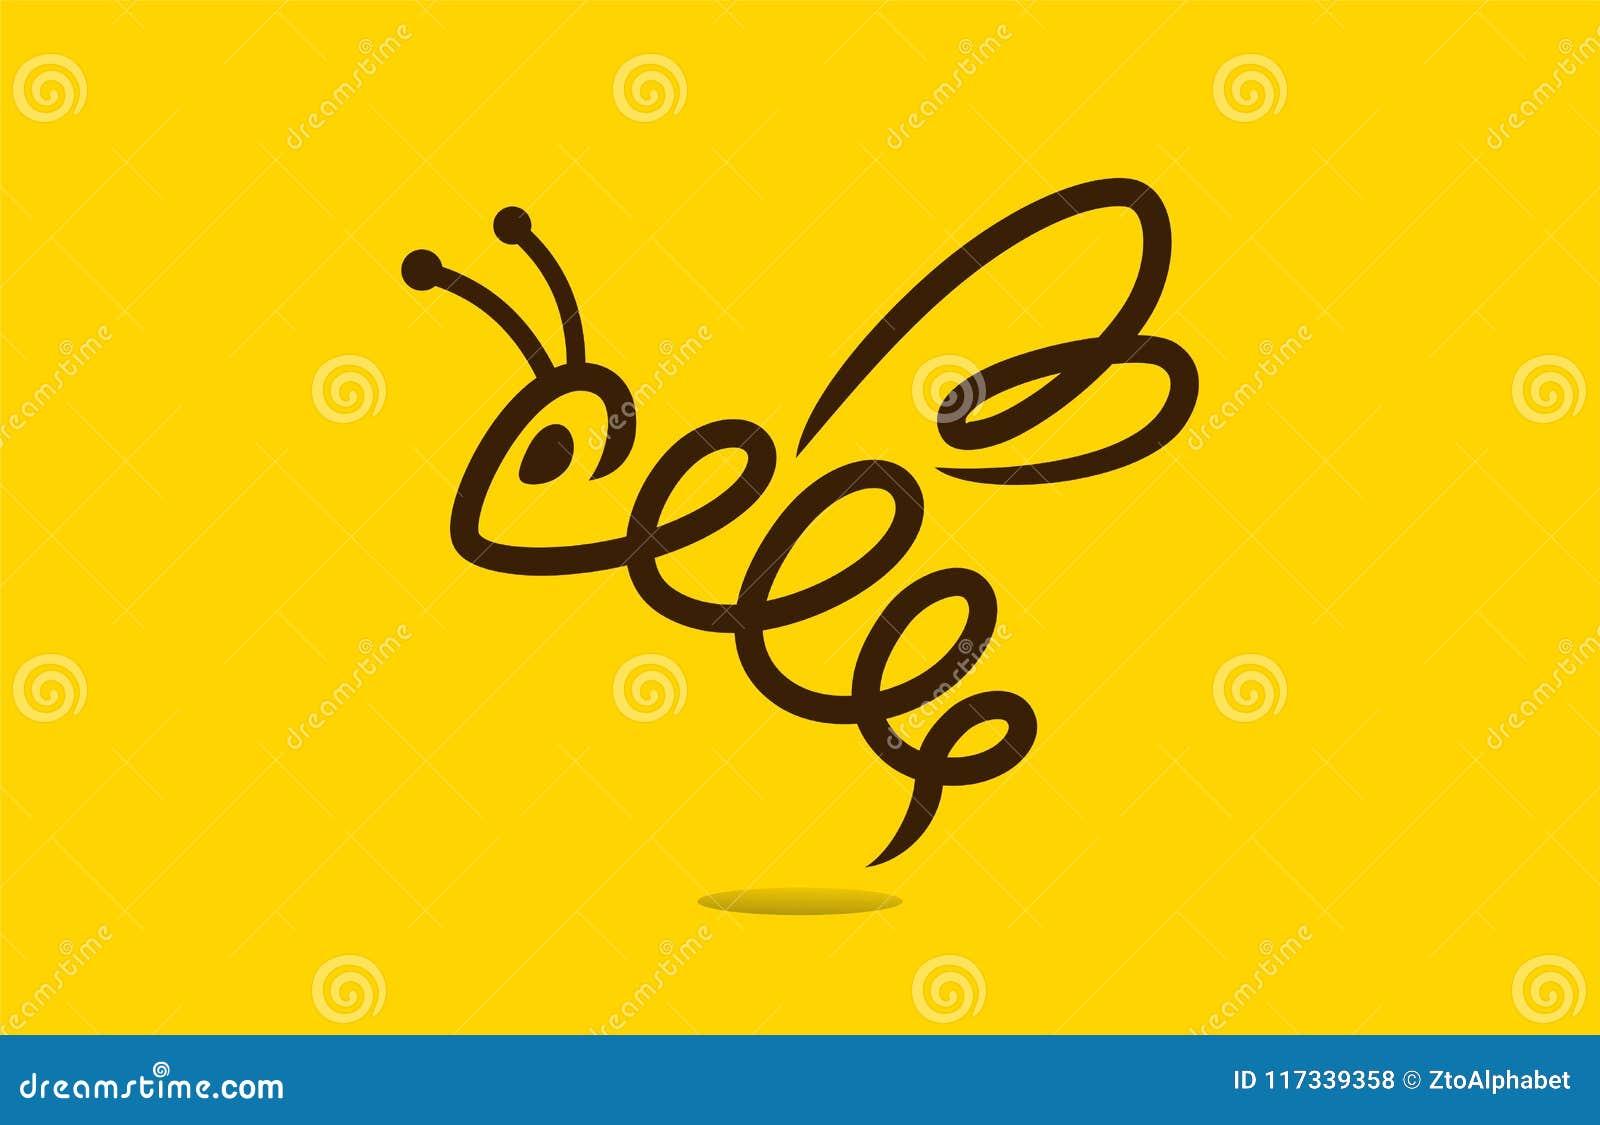 Plantilla del logotipo del concepto de la abeja de la miel